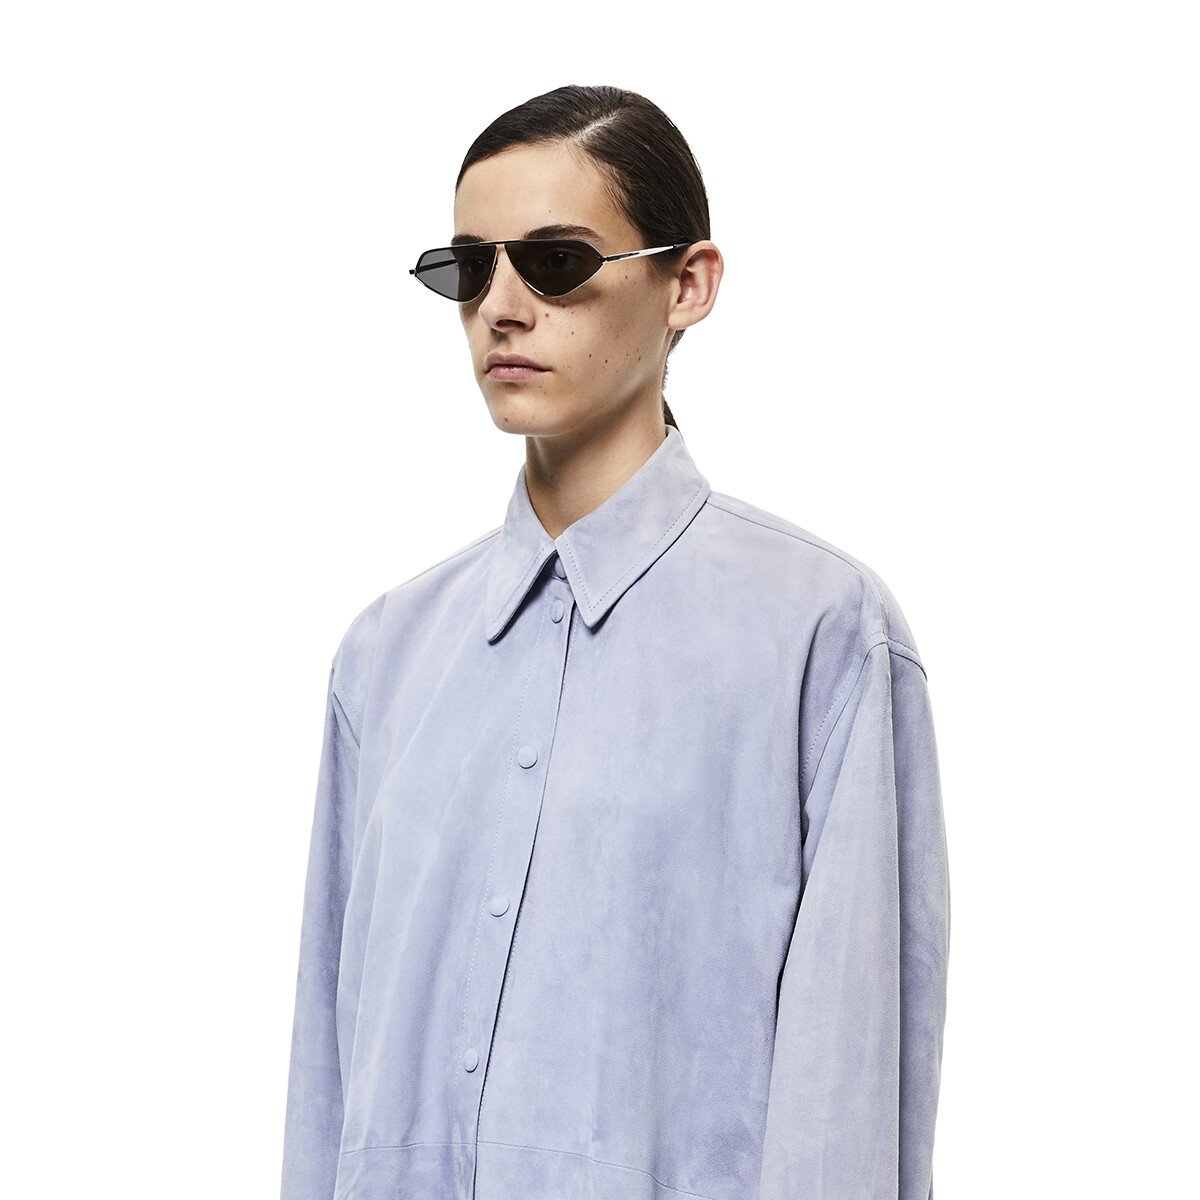 LOEWE Leather Geometric Sunglasses アンスラサイト front